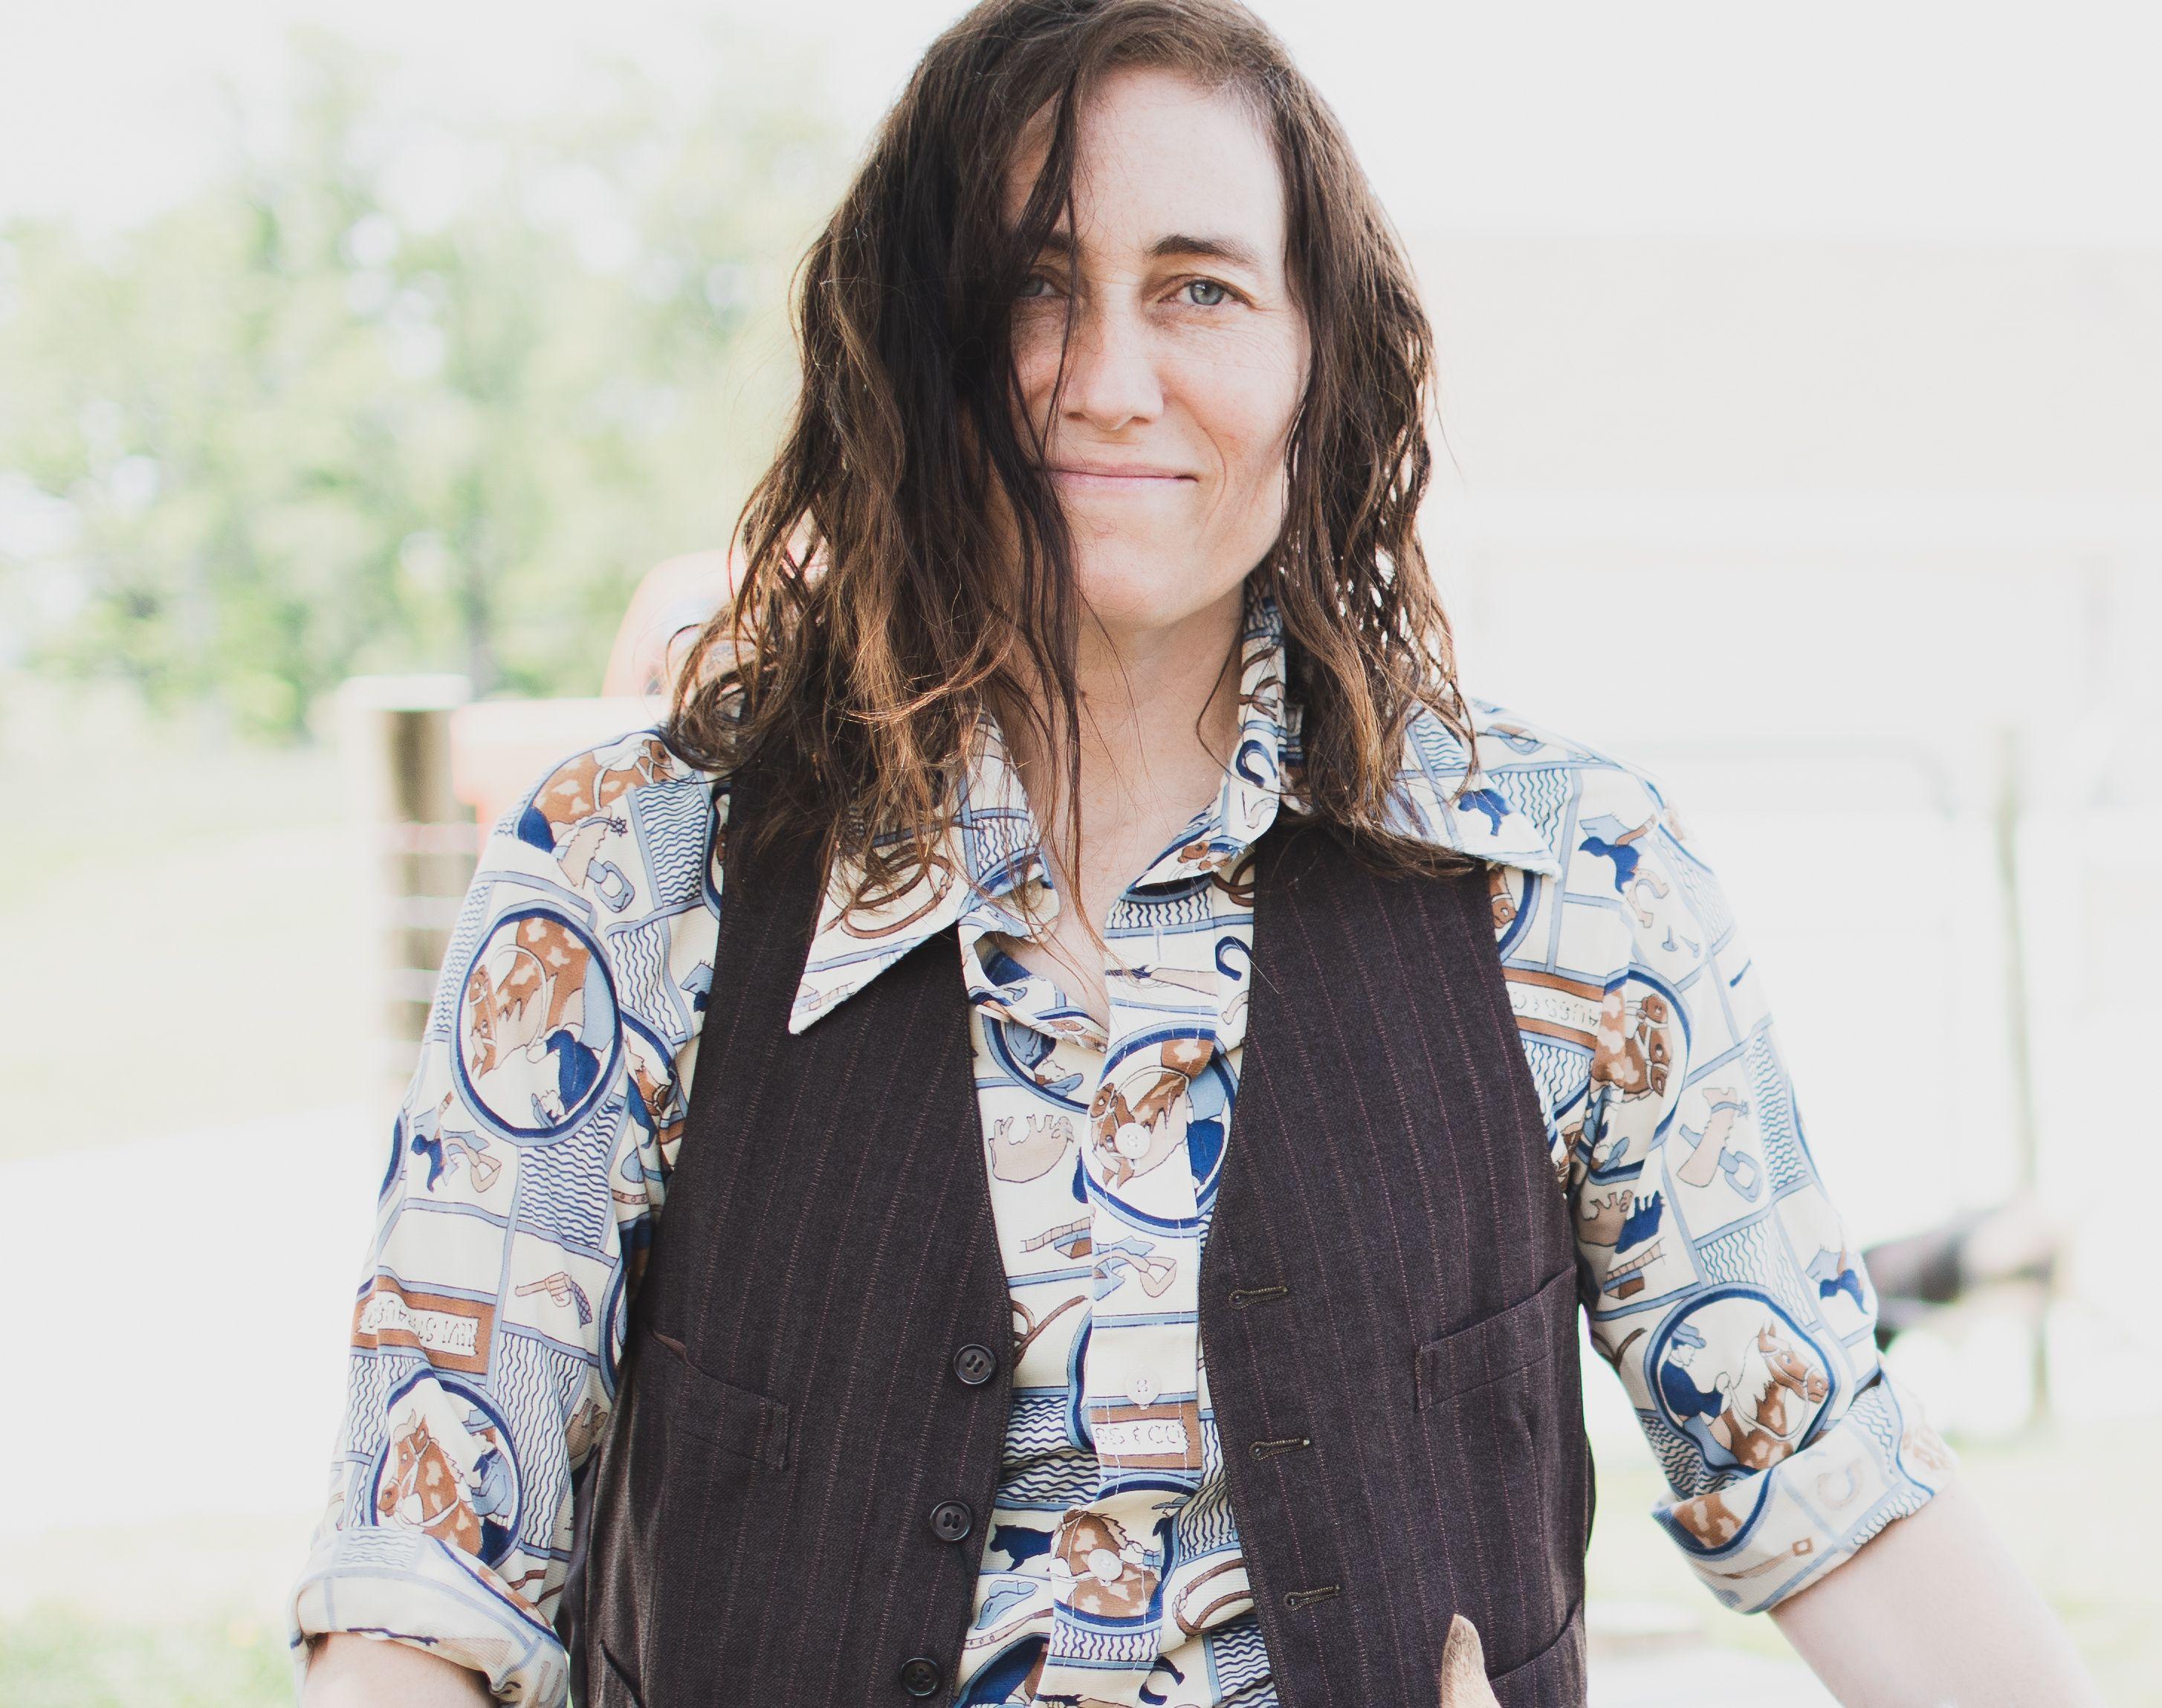 Melissa Carper (Photo by Aisha Golliher)